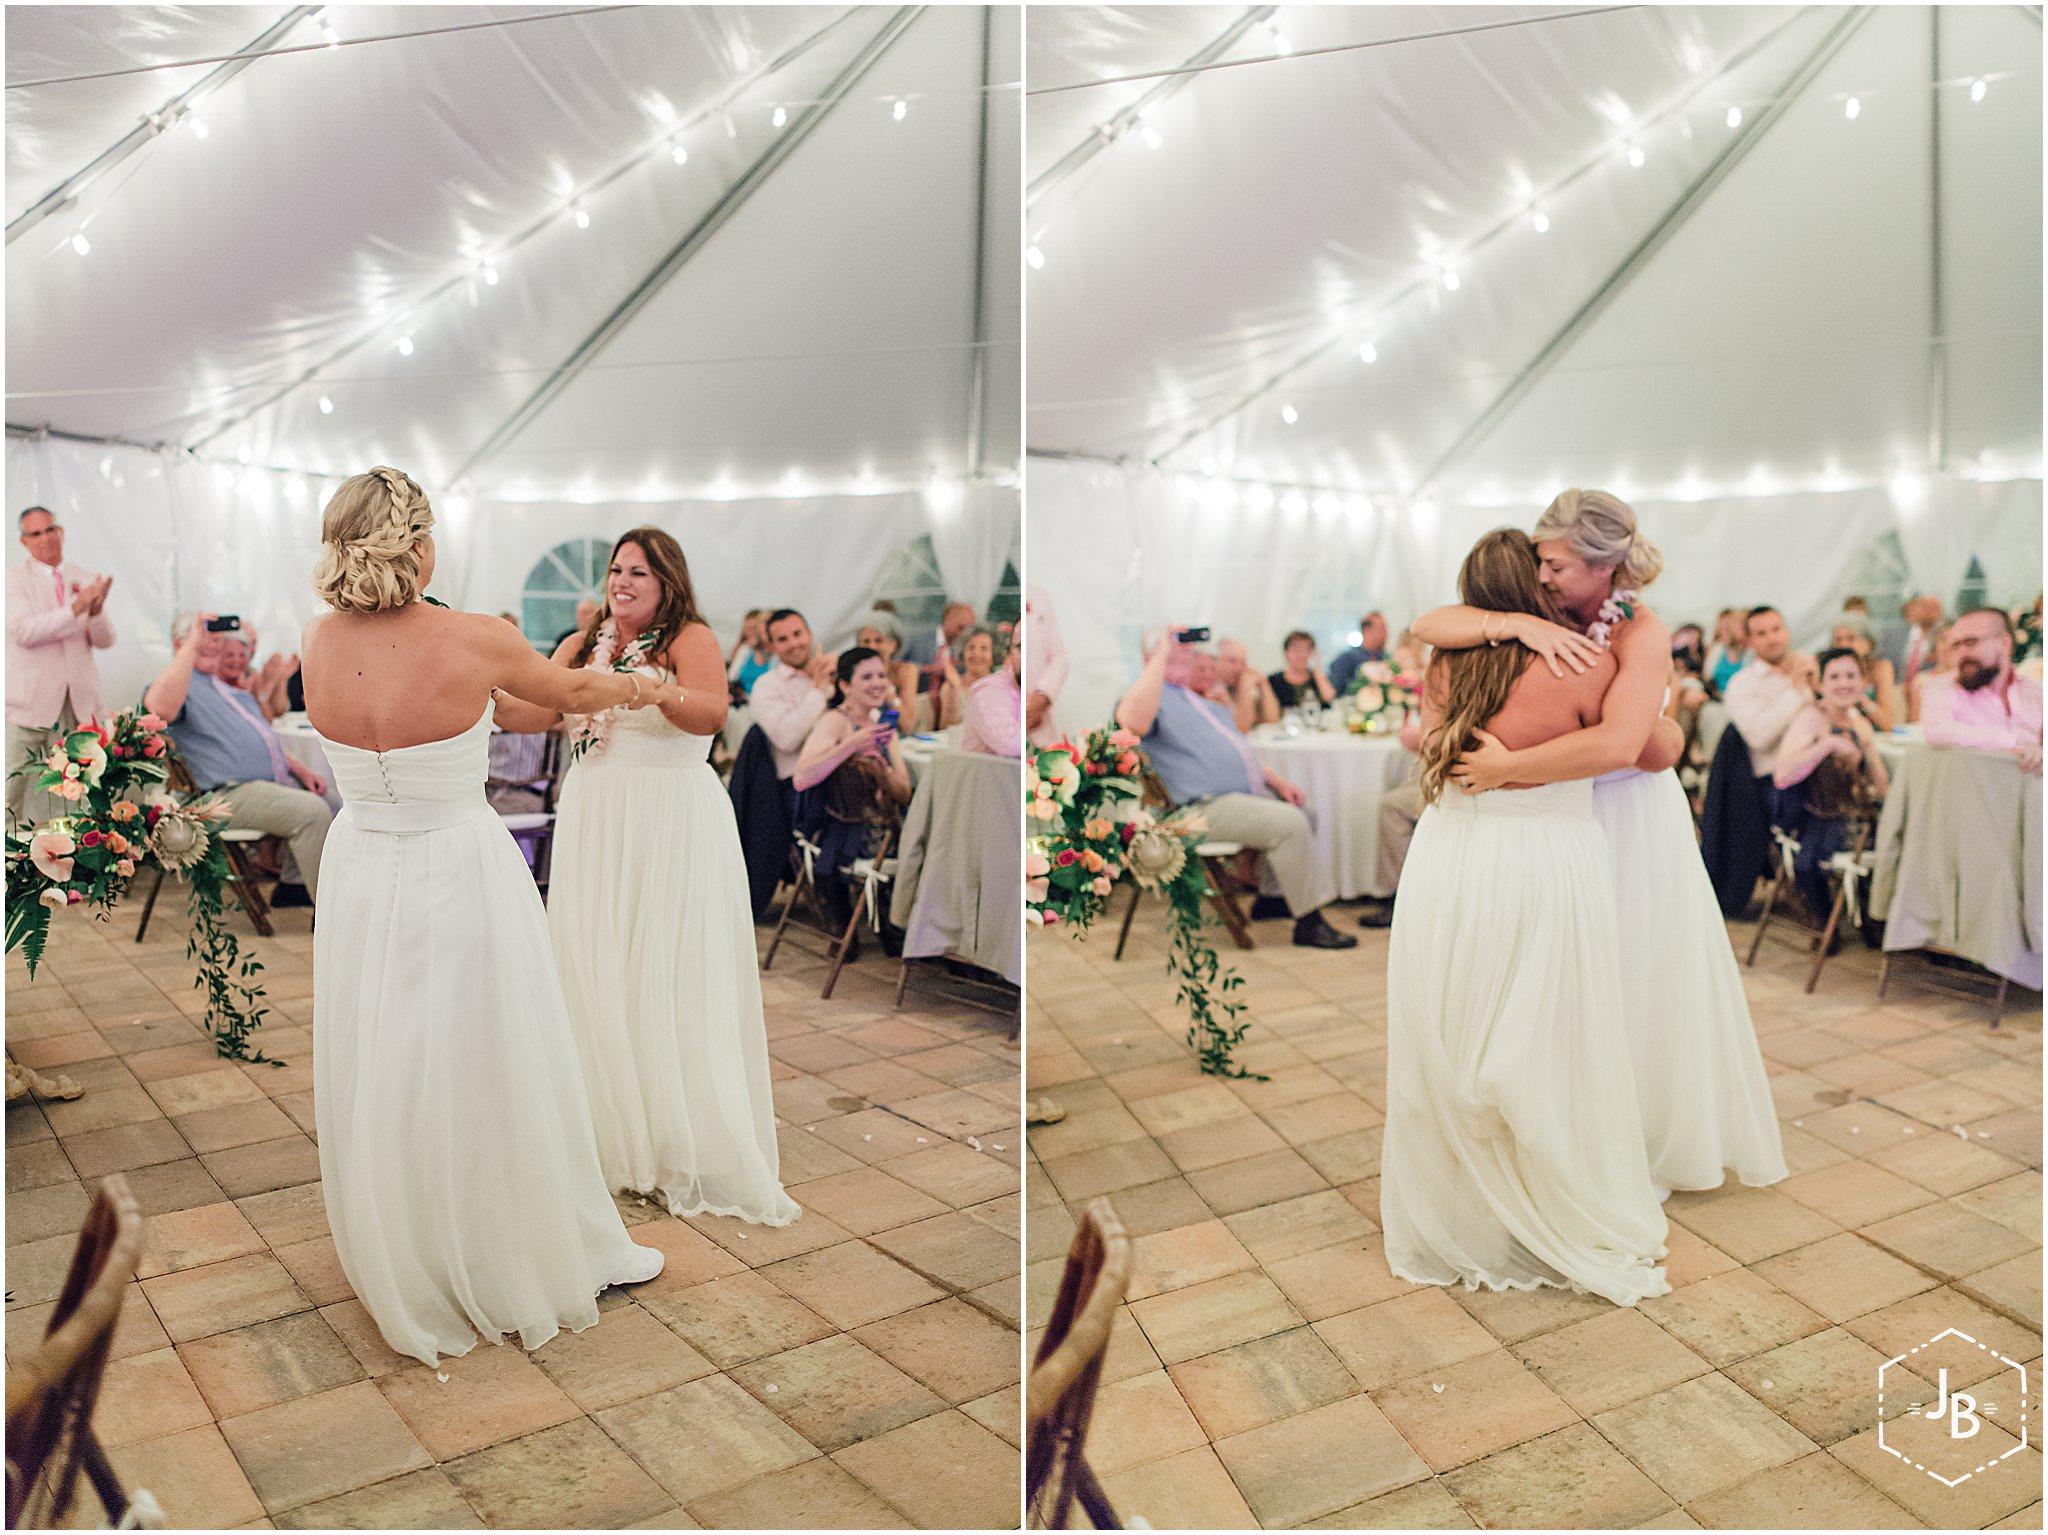 WeddingandEngagementFloridaPhotographer_1516.jpg